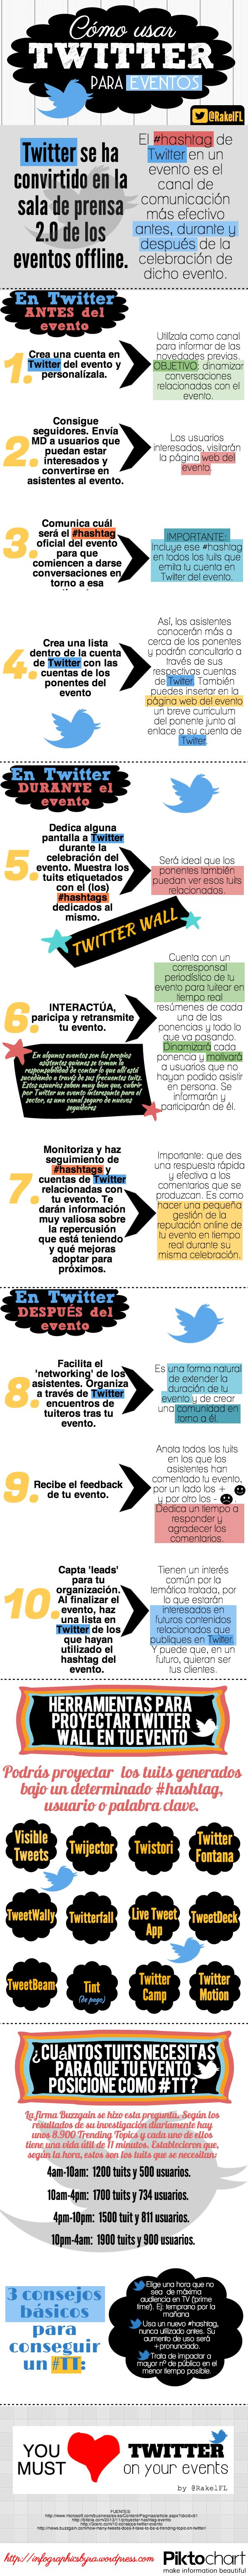 Cómo usar Twitter para eventos. Guía básica. Infografía en español